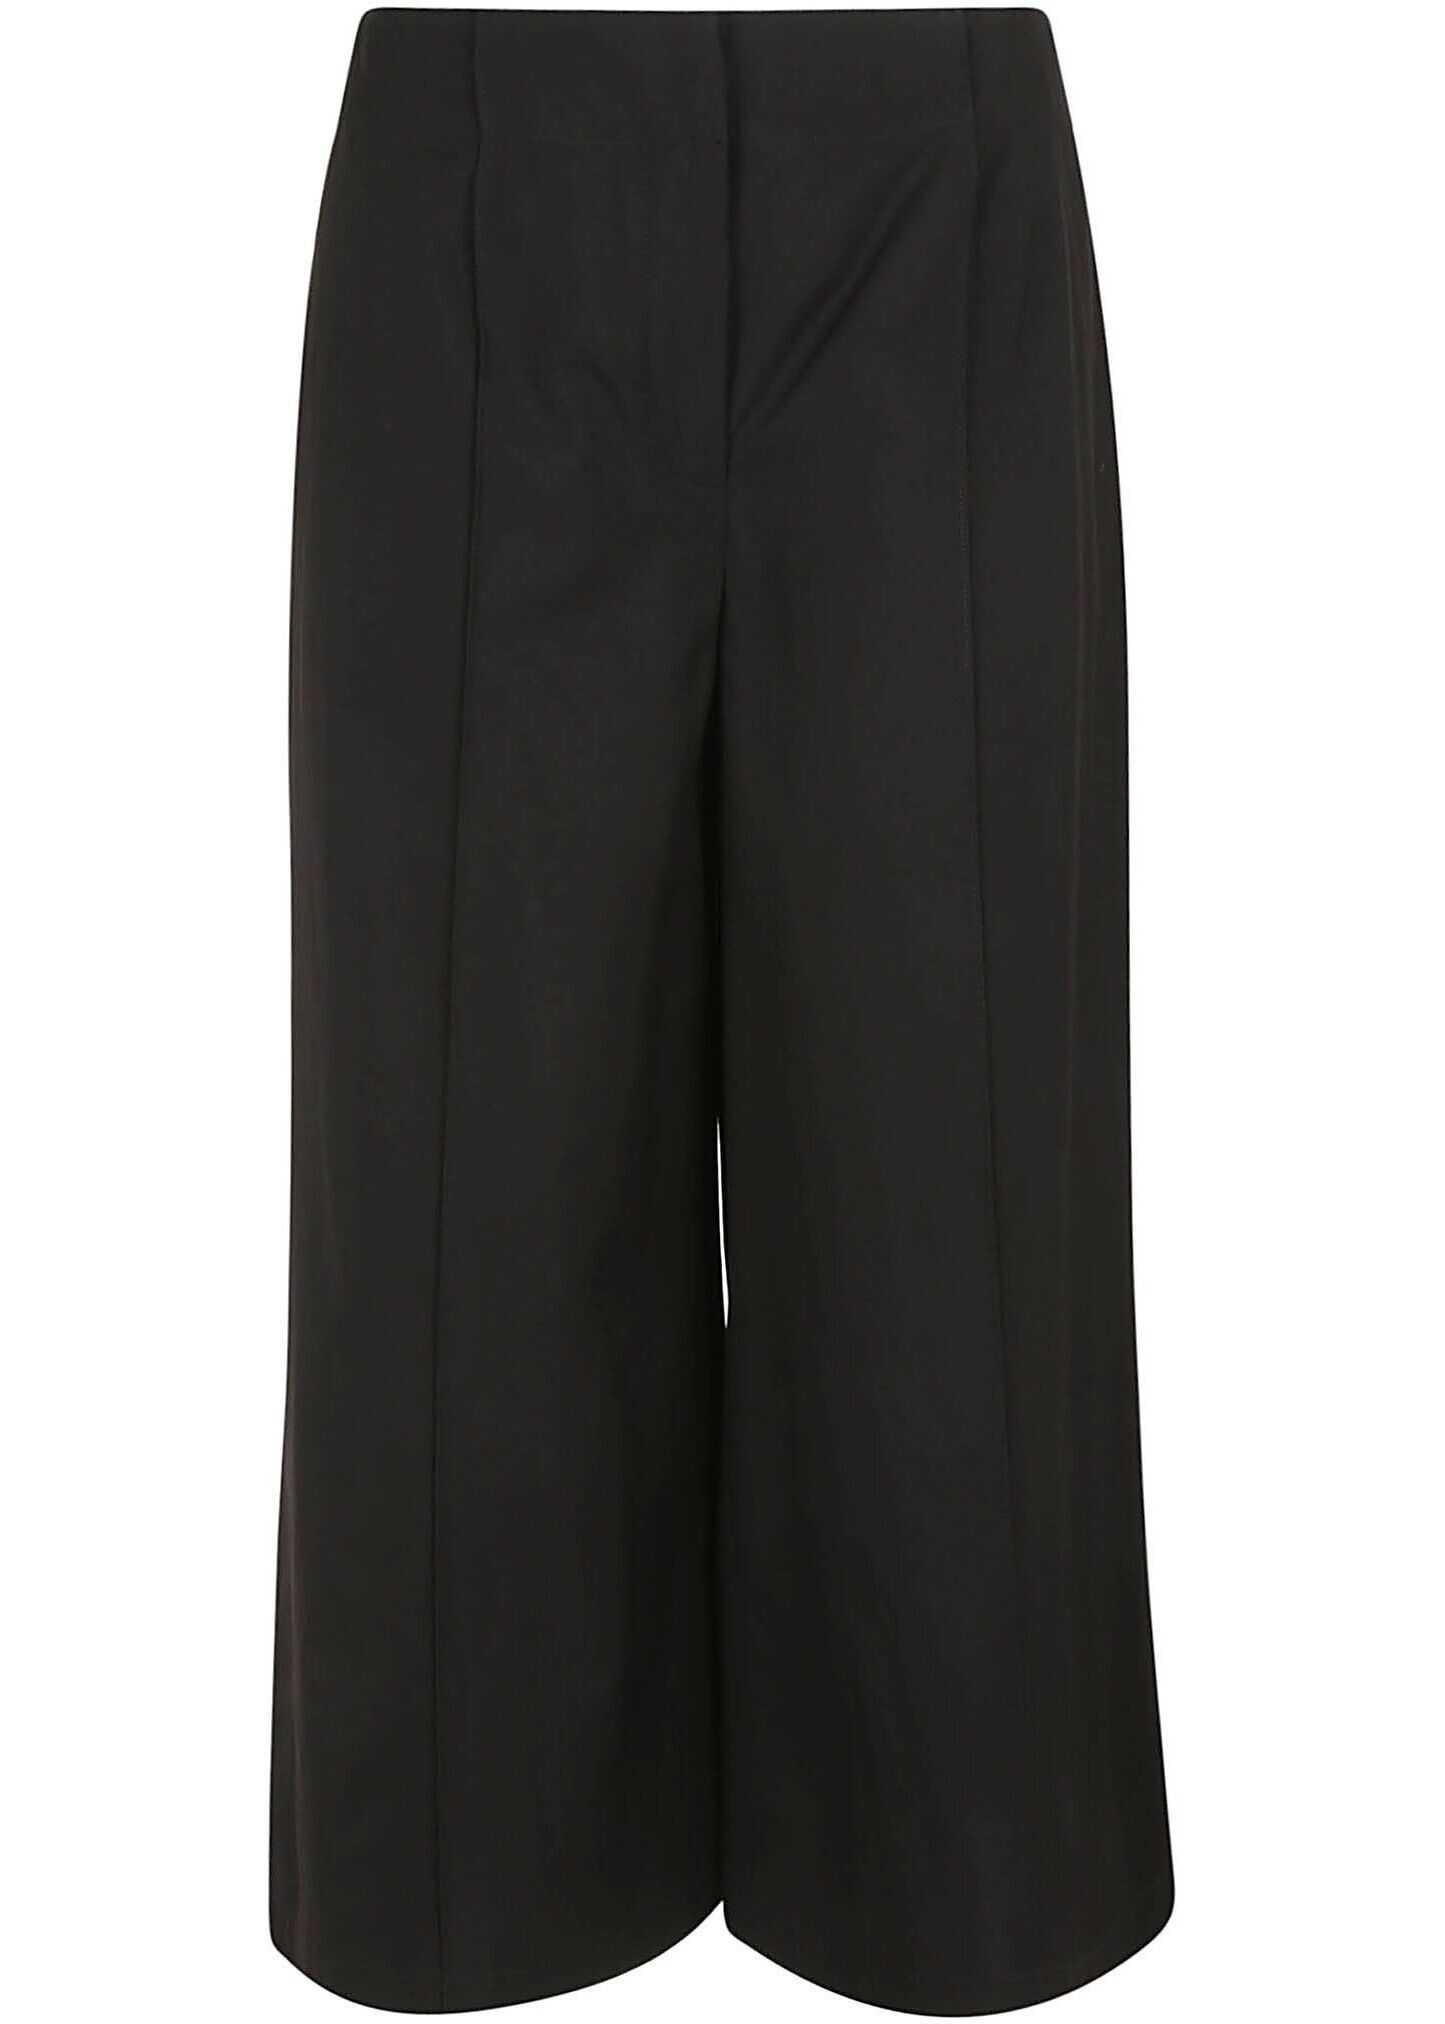 Moschino Viscose Pants BLACK